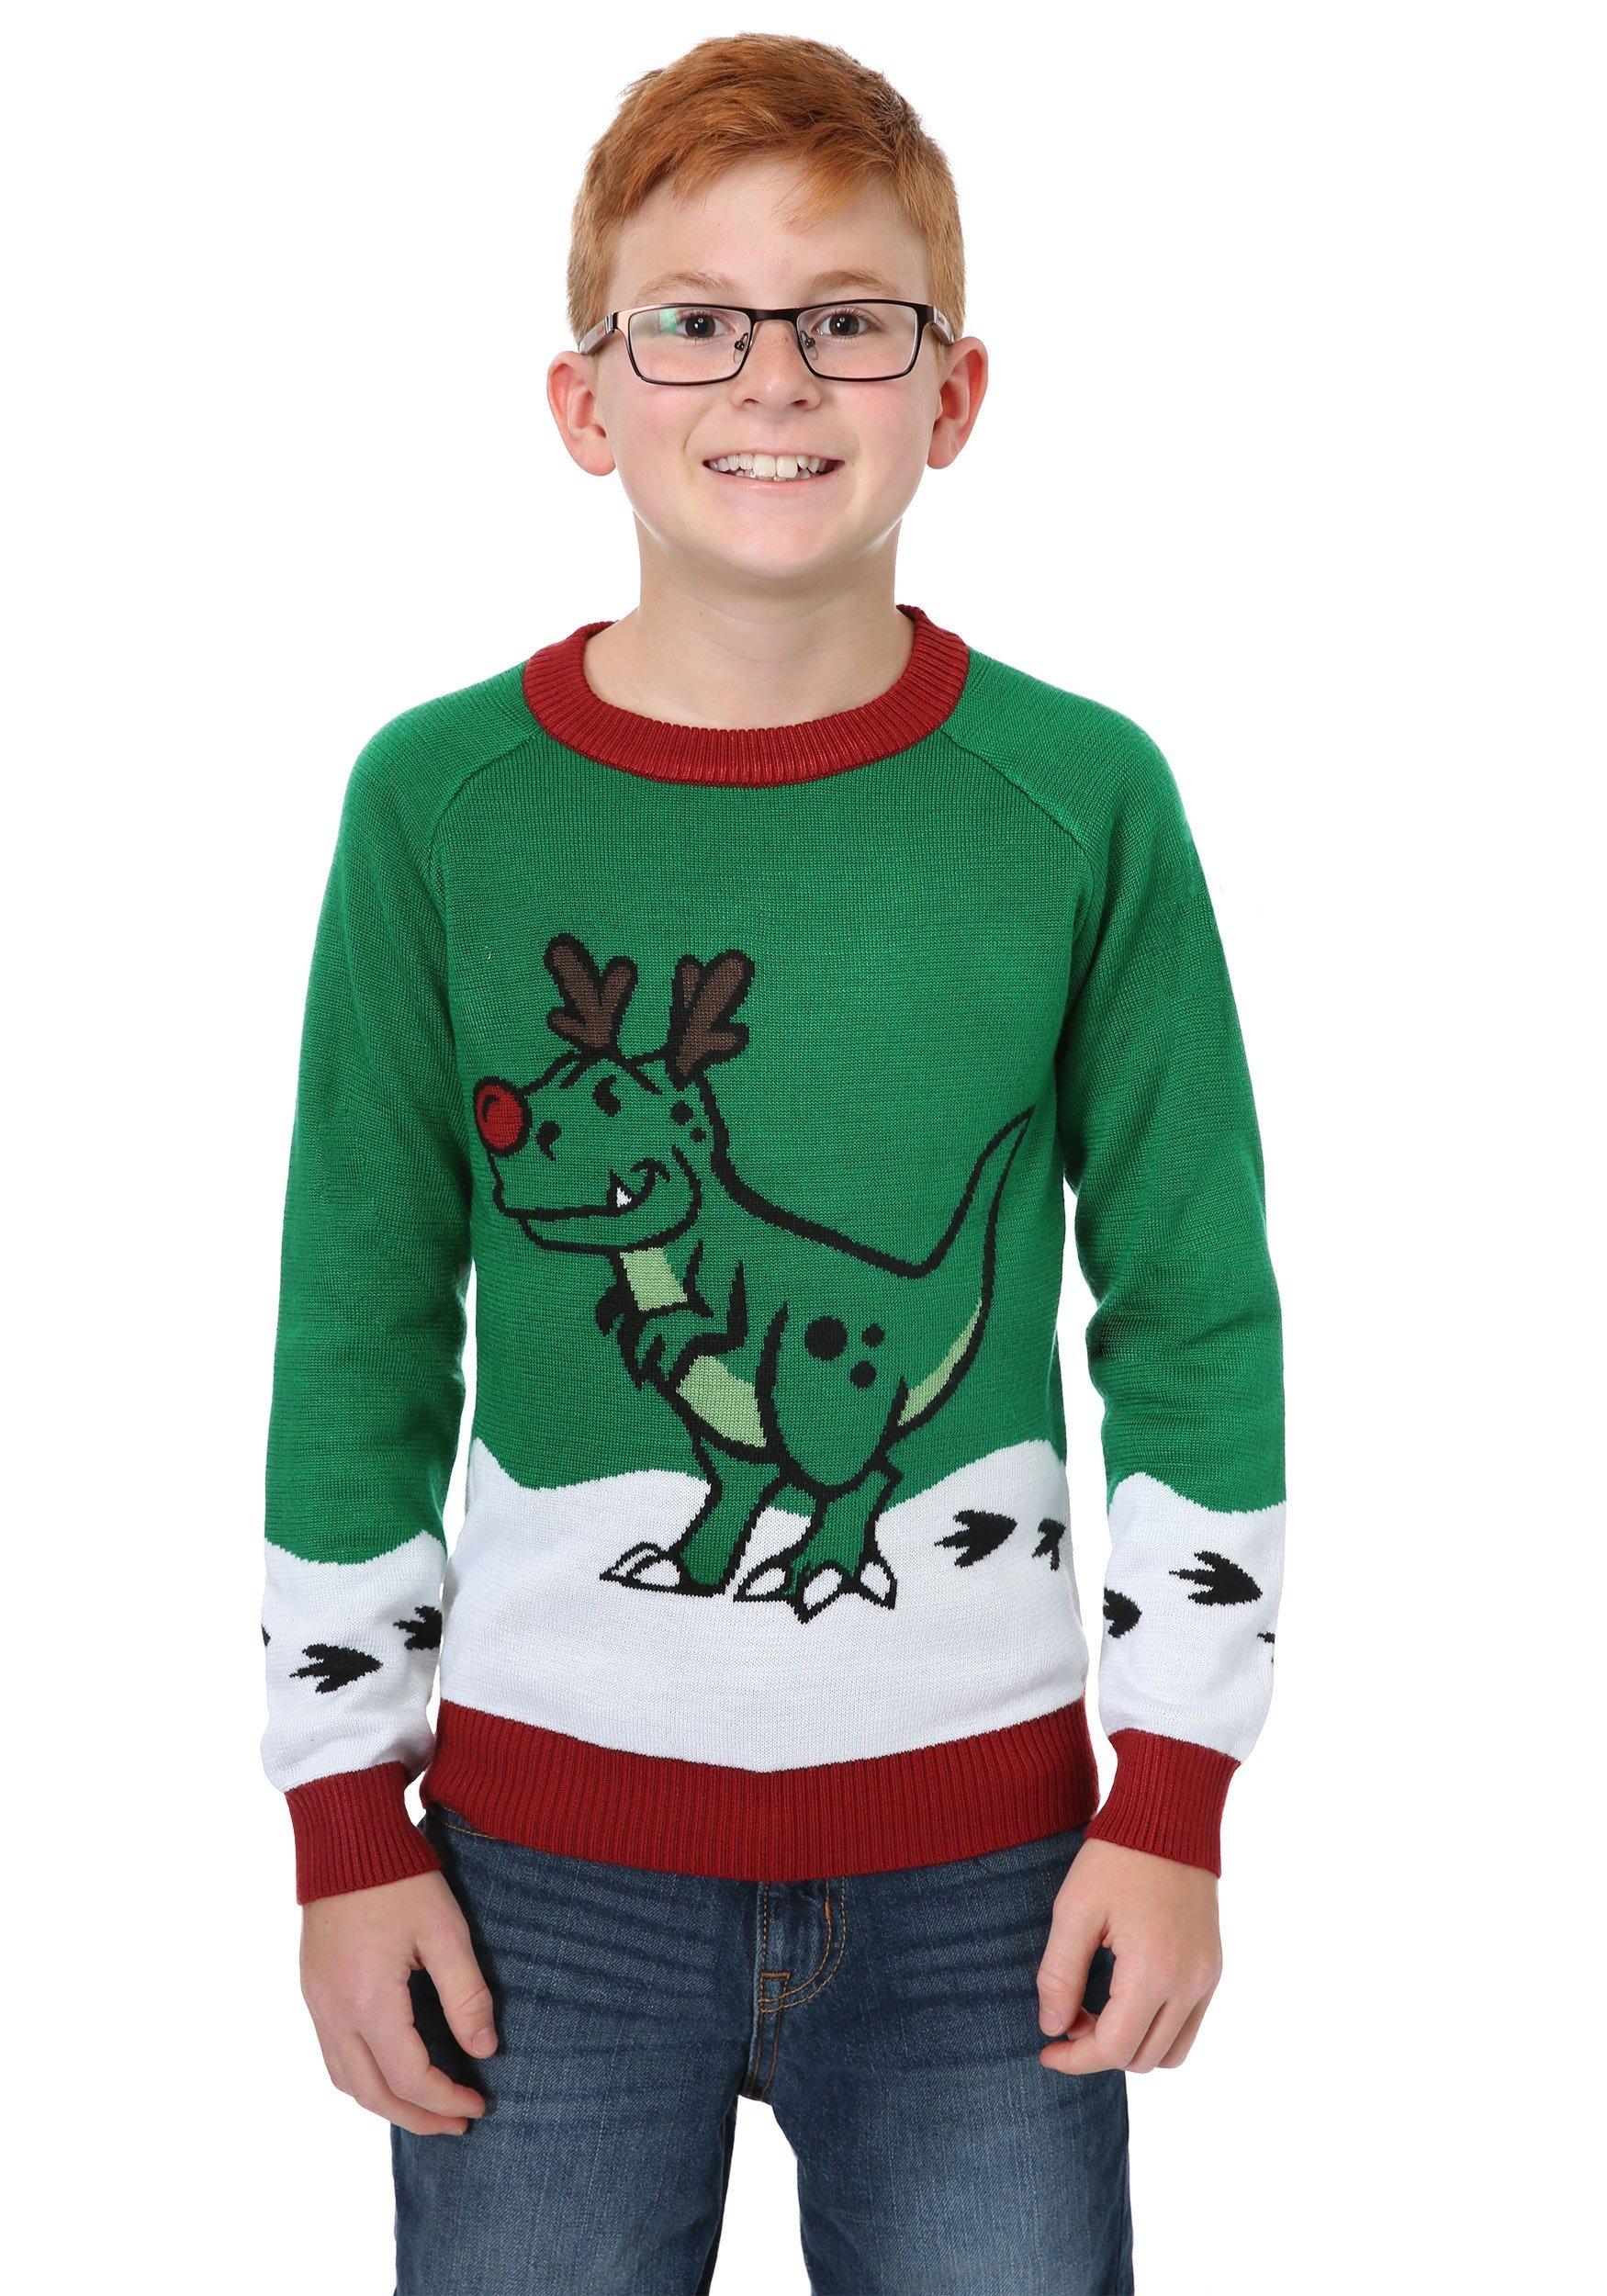 Boys Reindeer Dinosaur Ugly Christmas Sweater 4T